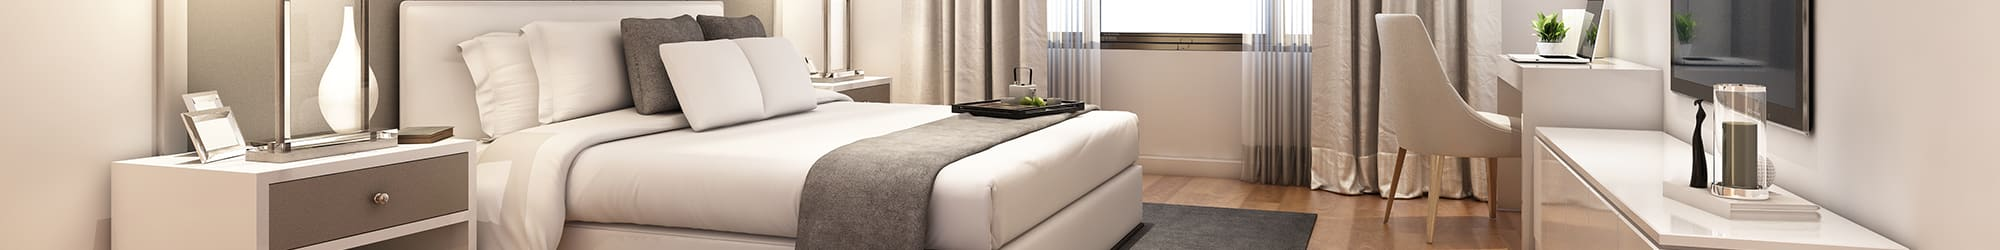 interior-hotel-room